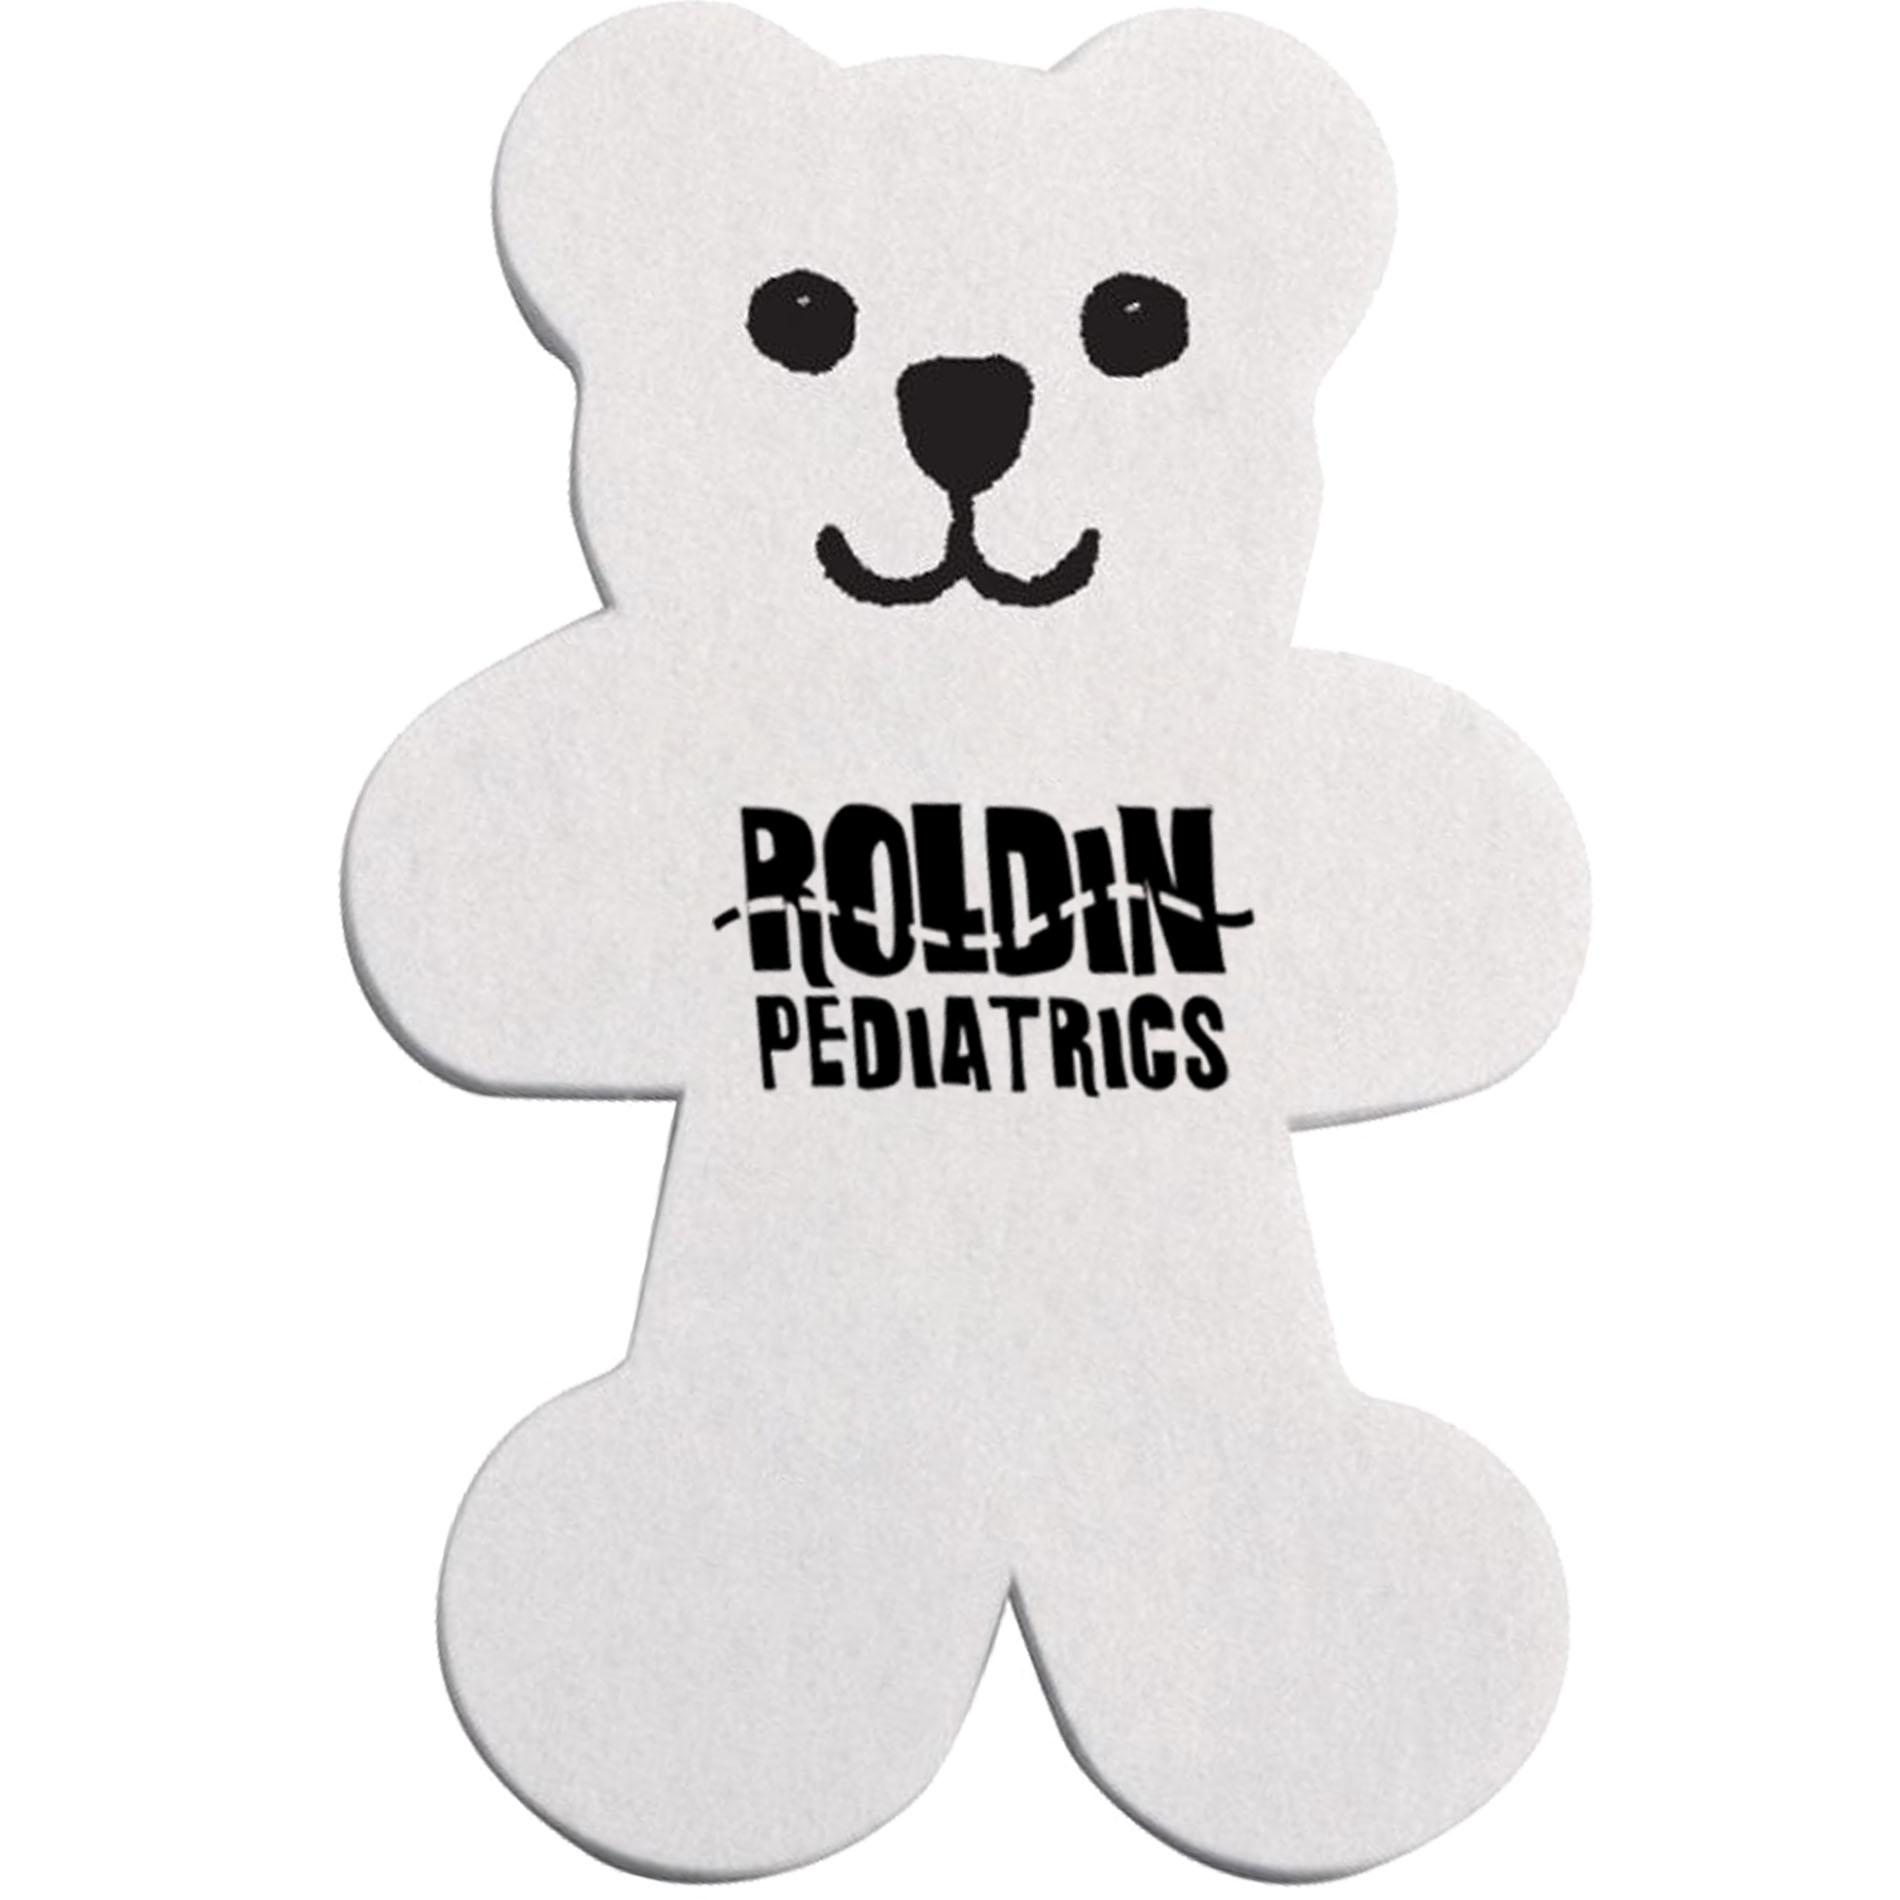 Baby Bear Foamcor Baby Emery Board